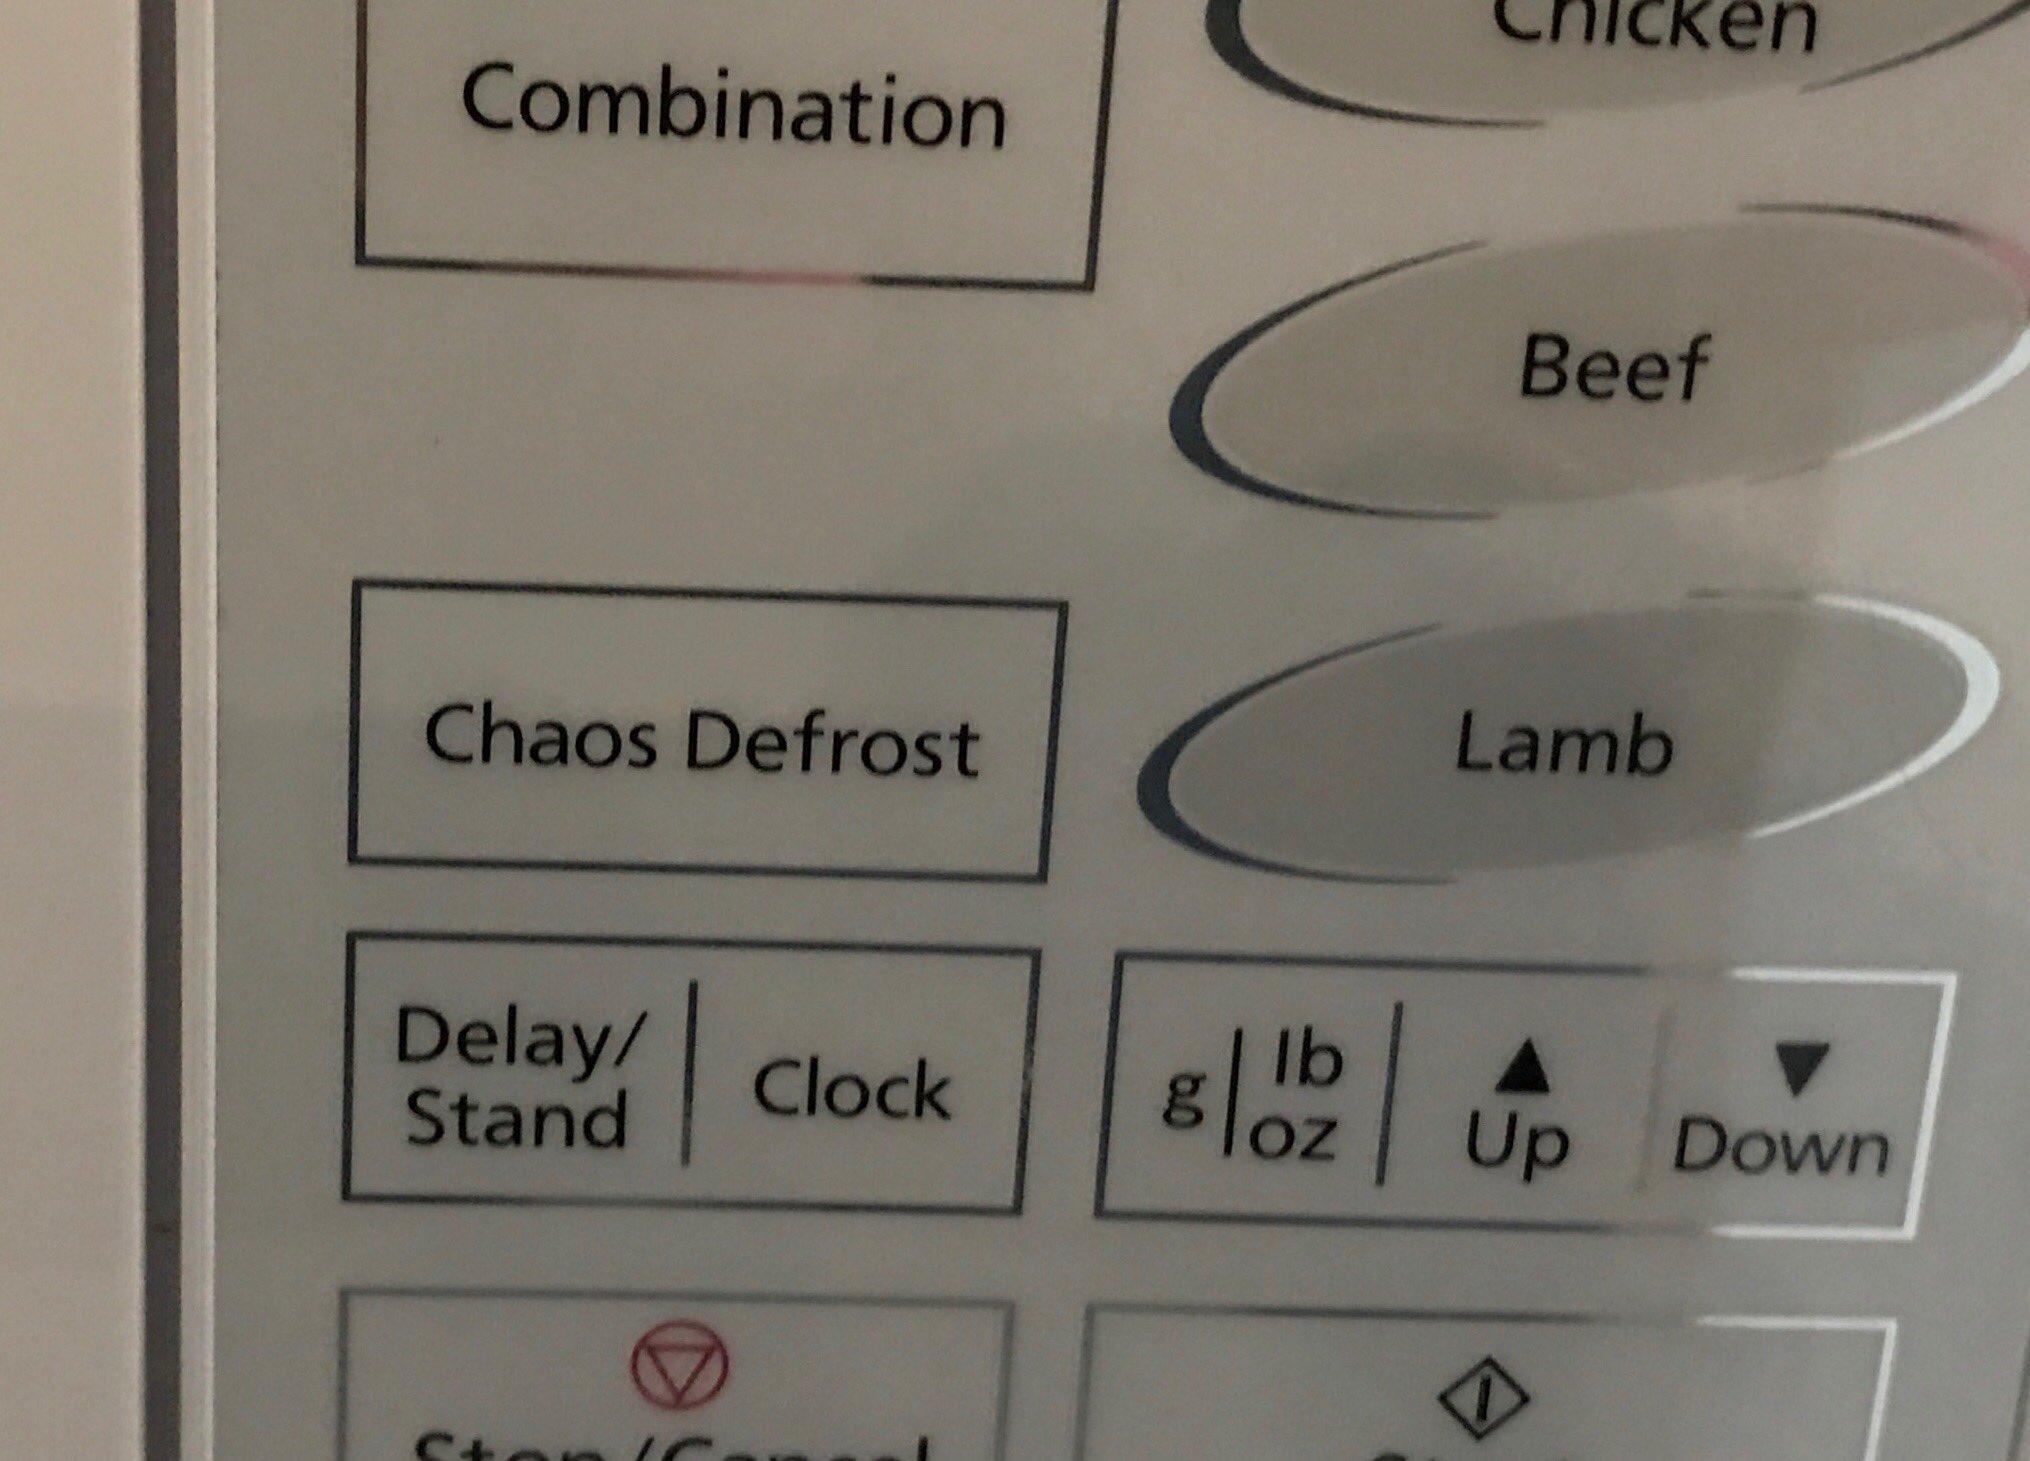 Isn't Chaos Defrost the villain in the new Marvel film? https://t.co/piZArrtdvS